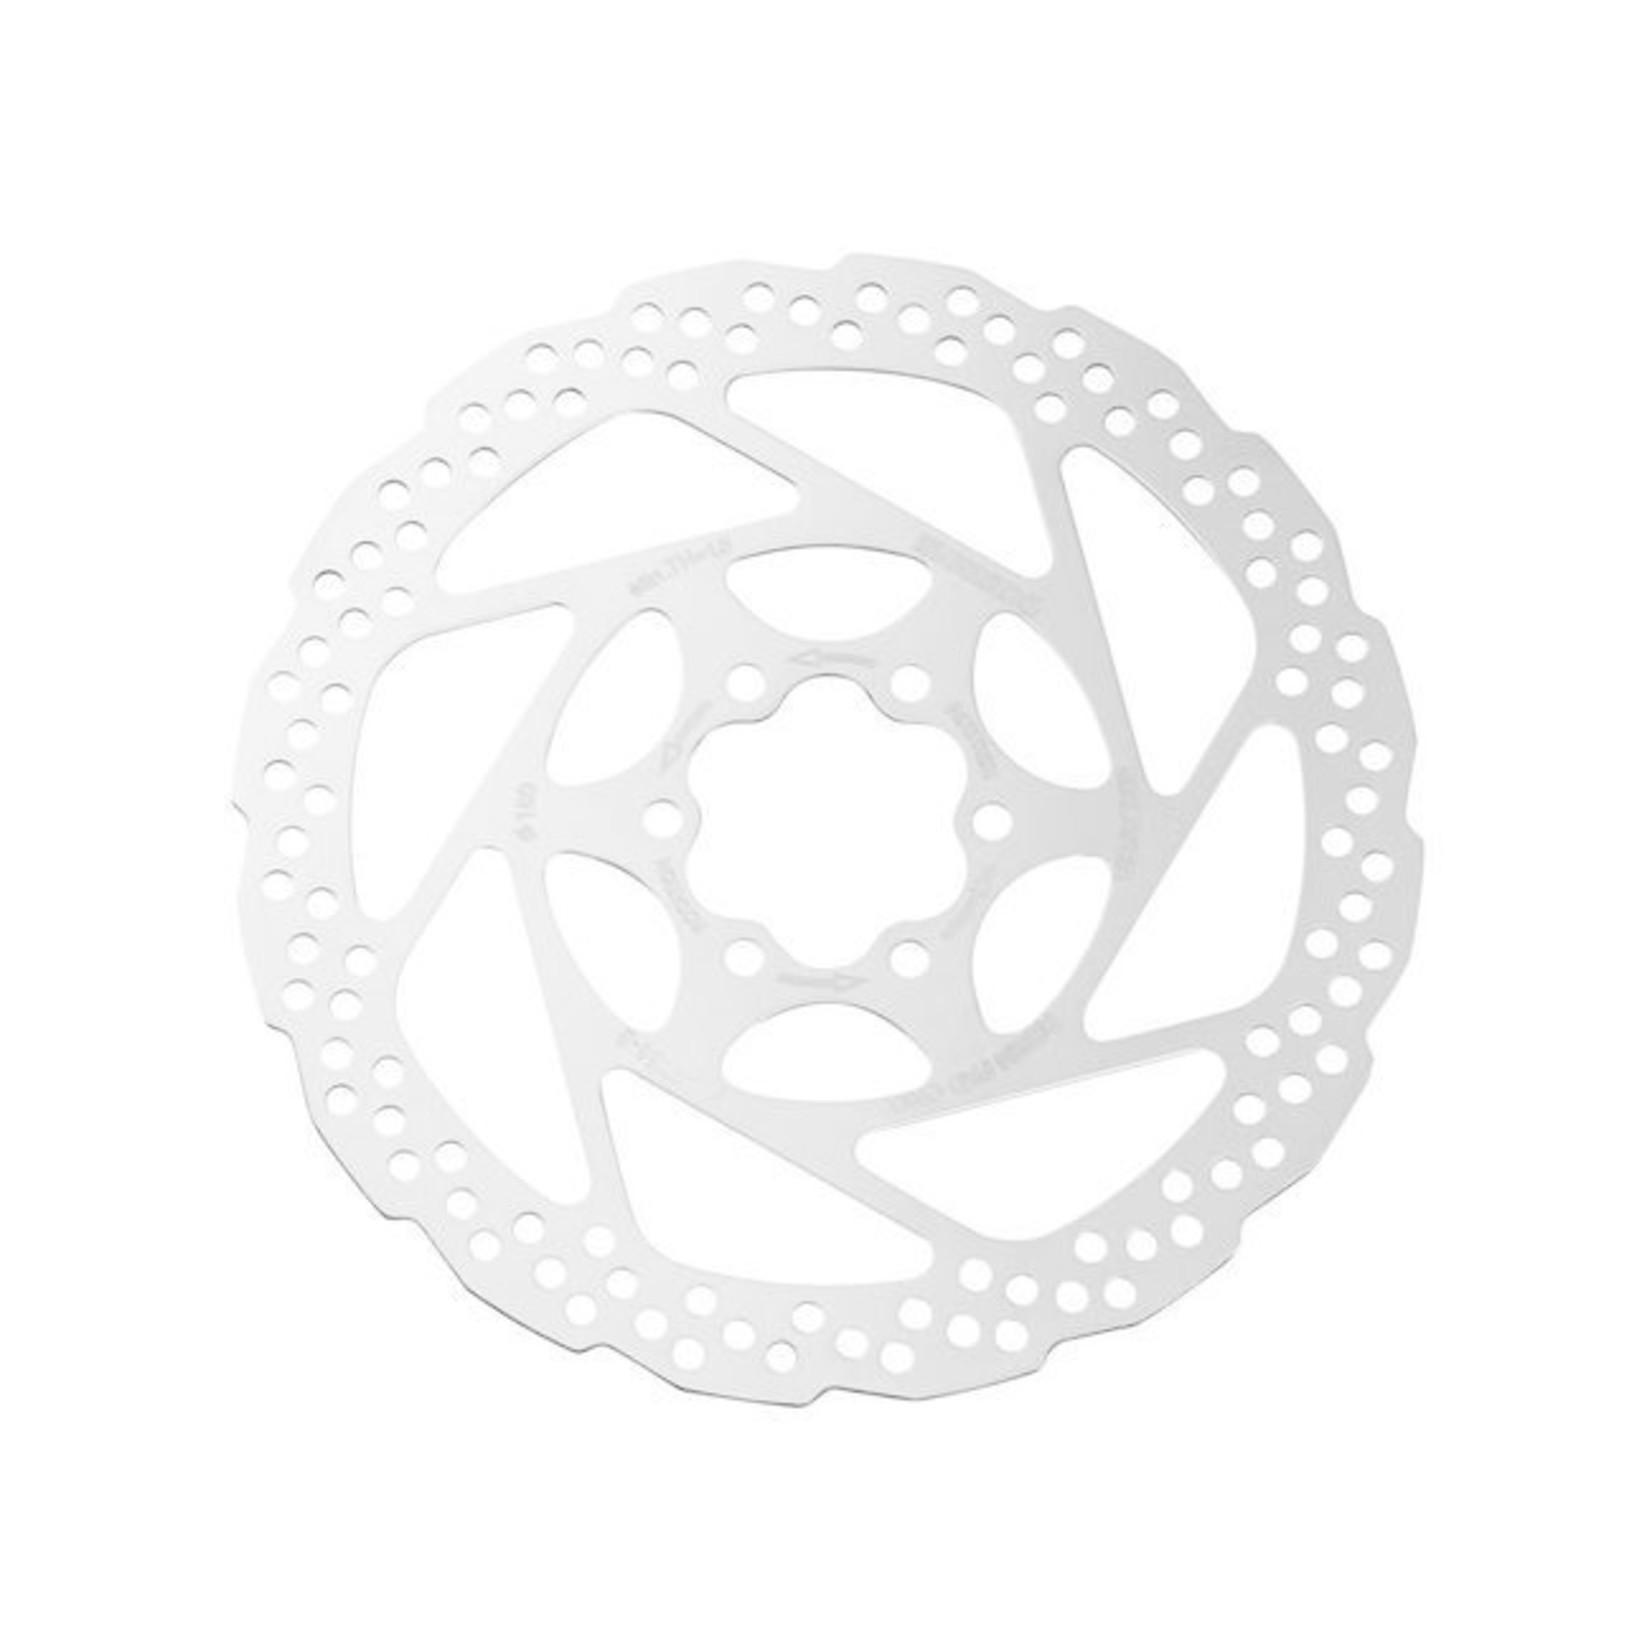 Shimano SM-RT56, Disque, 160mm, ISO, Pour patins en resine seulement